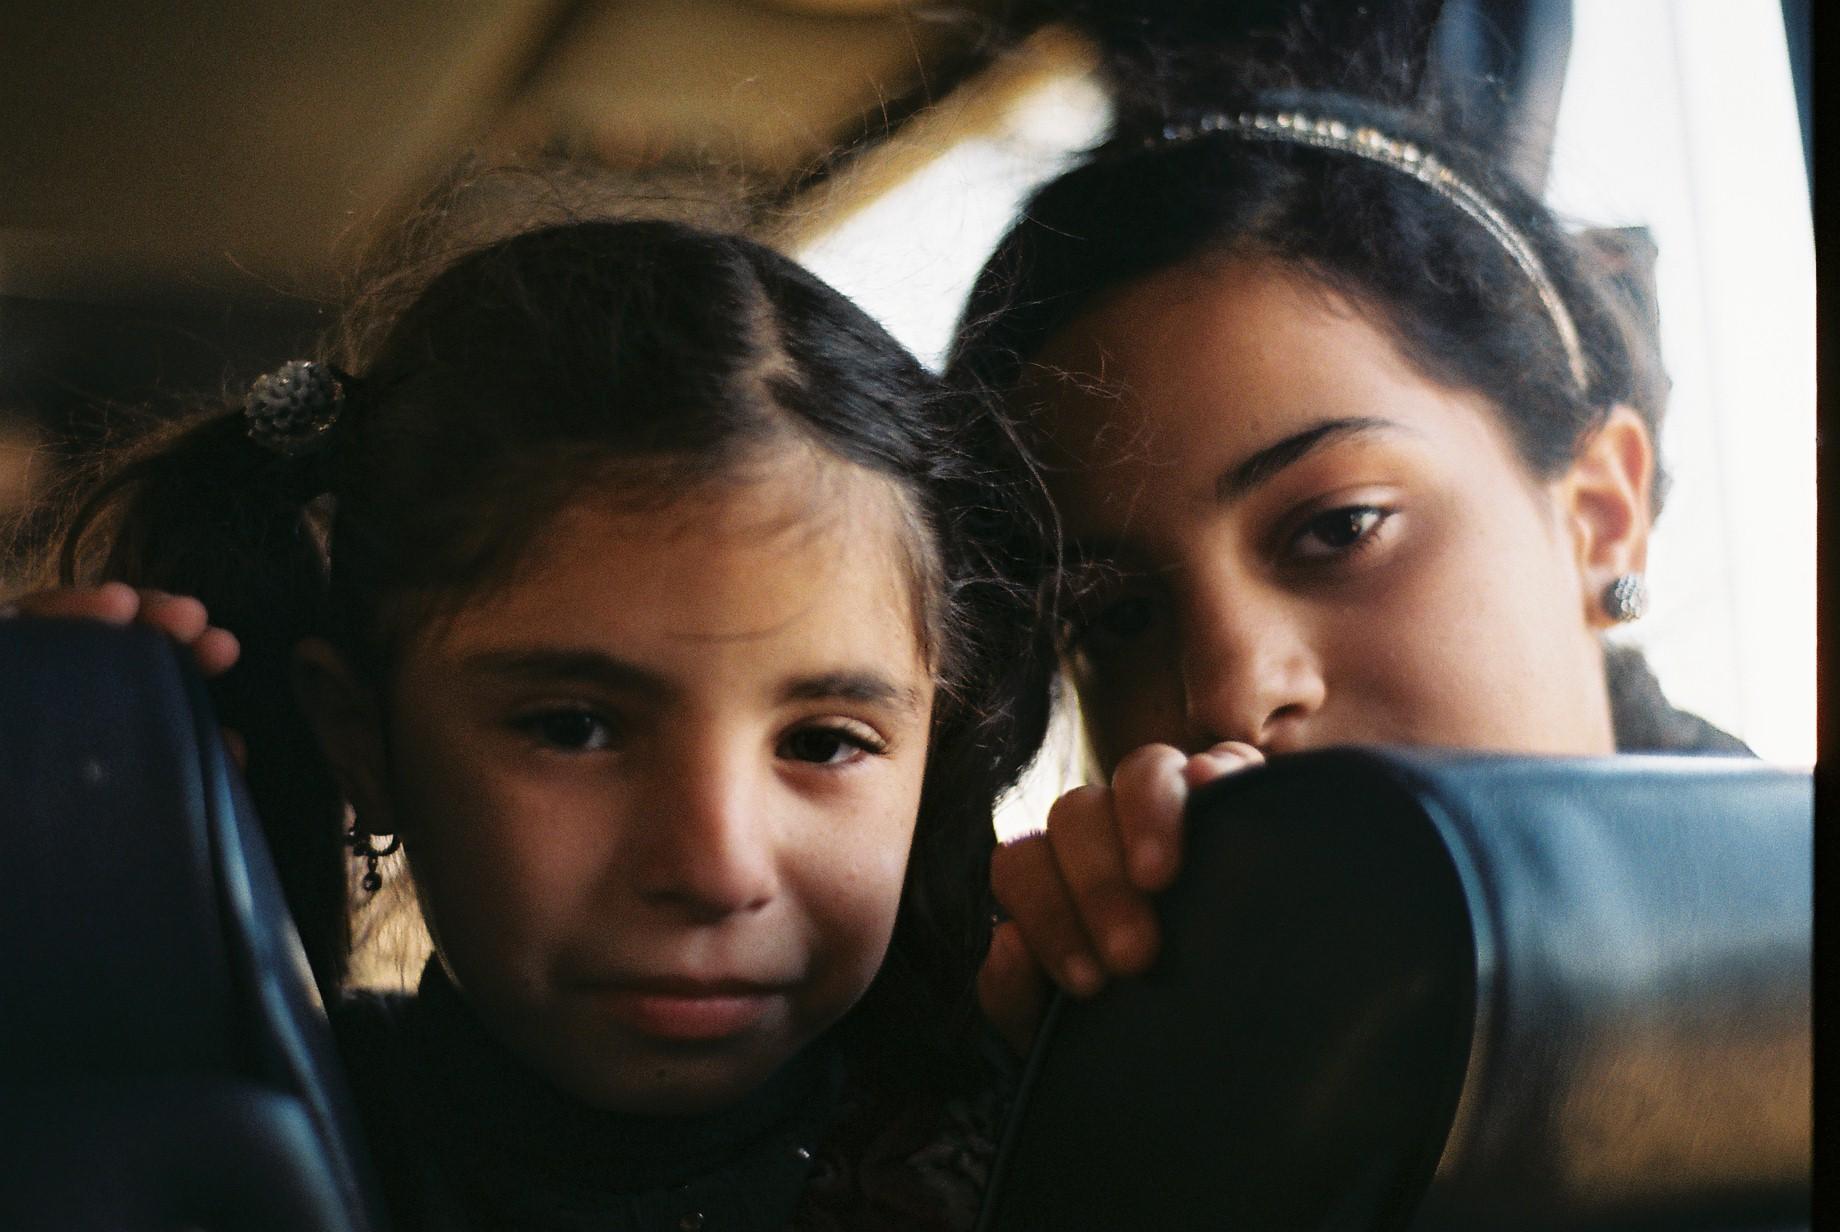 Palestine, 2011